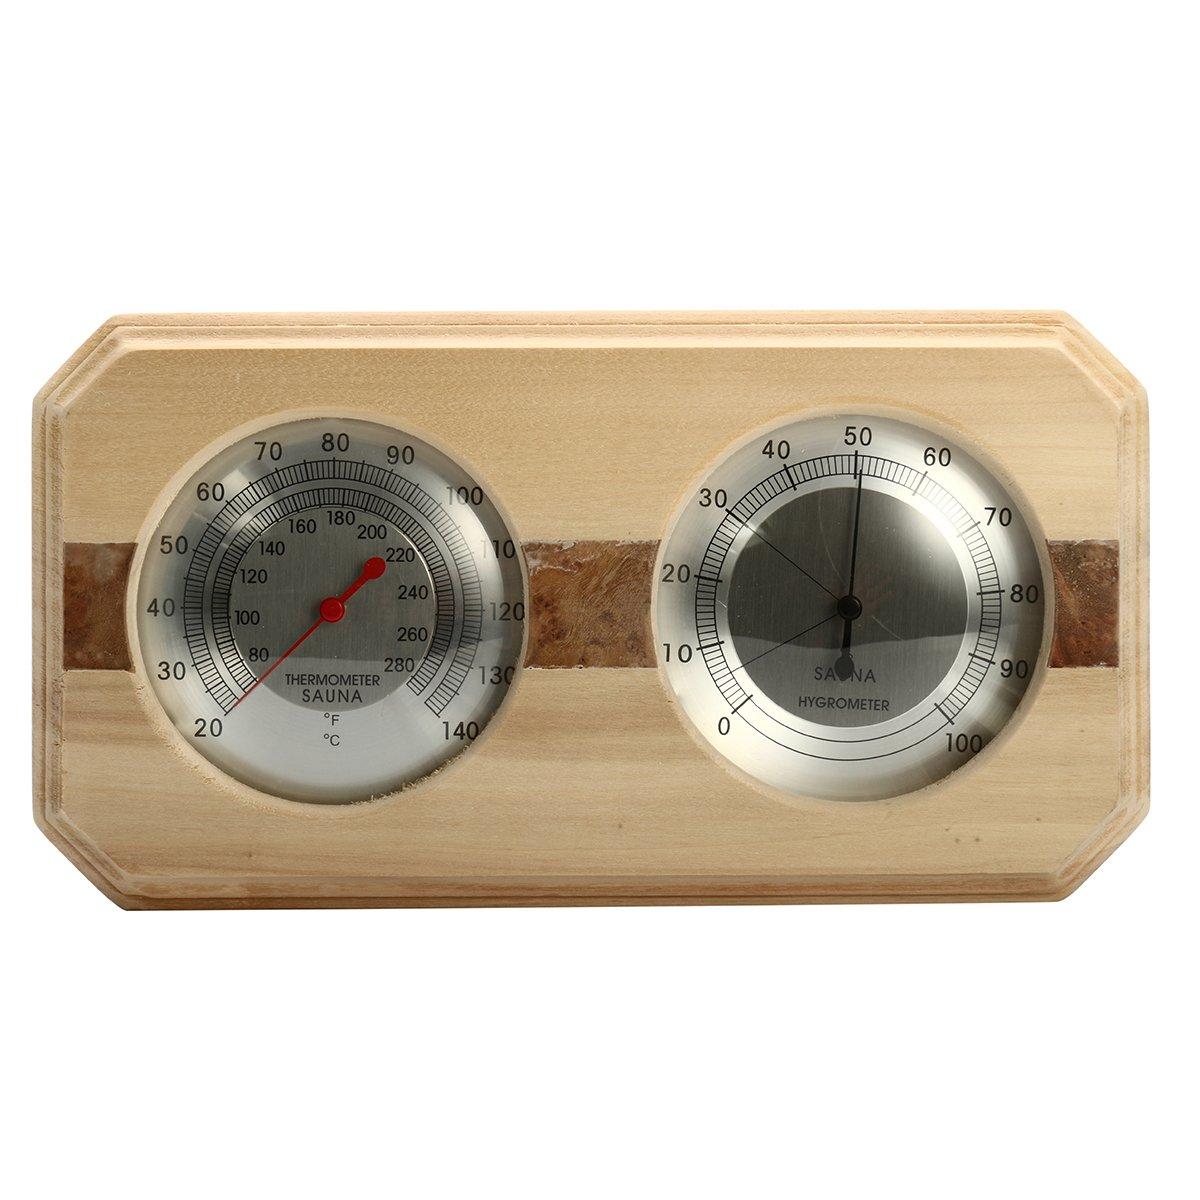 INNI Wooden Sauna Hygrothermograph Thermometer Hygrometer Sauna Room Accessory